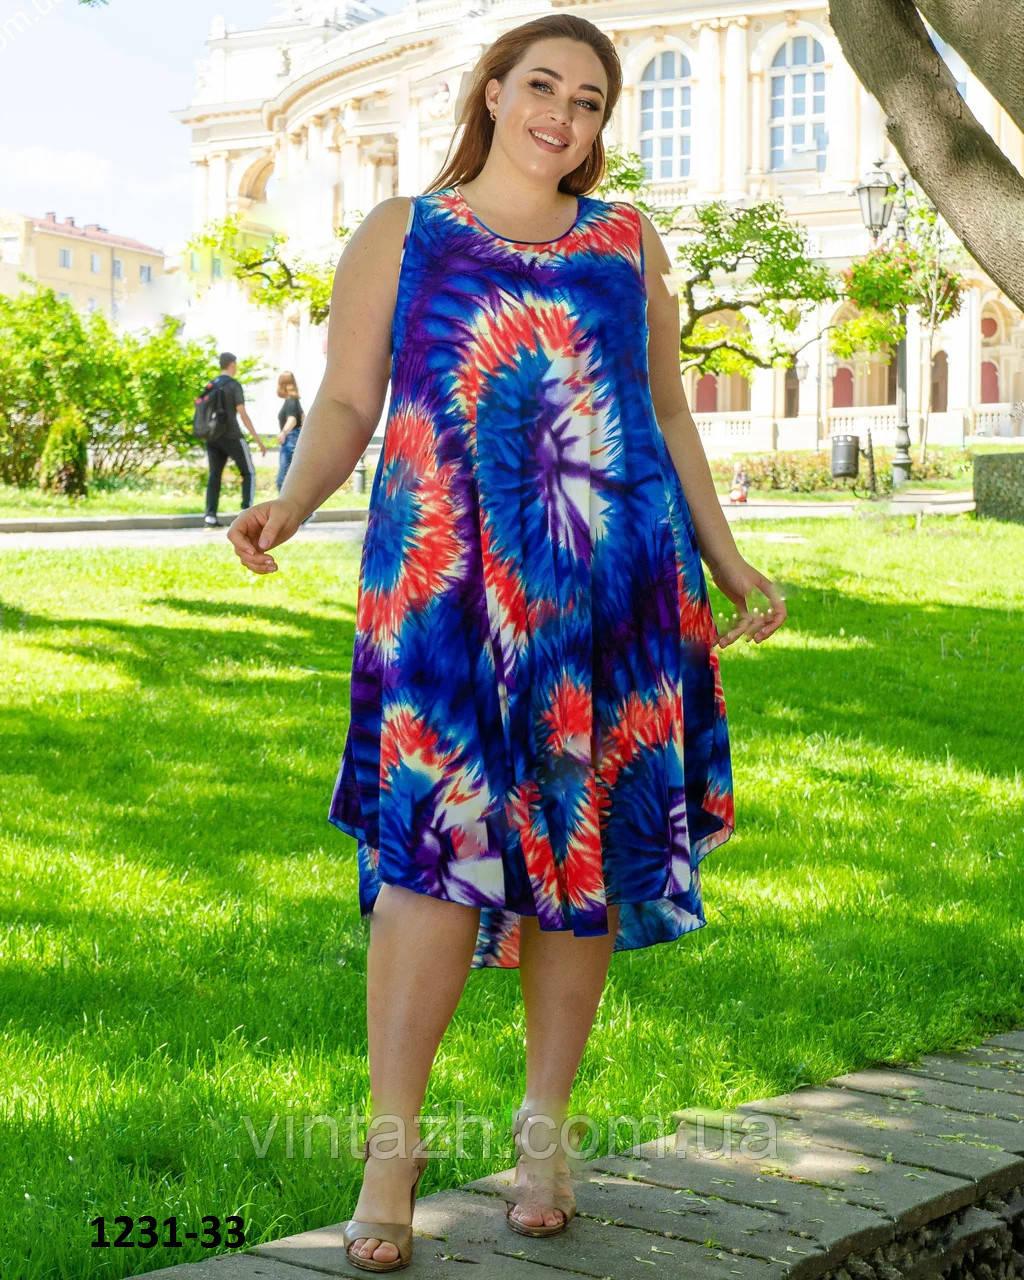 Модный женский сарафан размеры 52-56